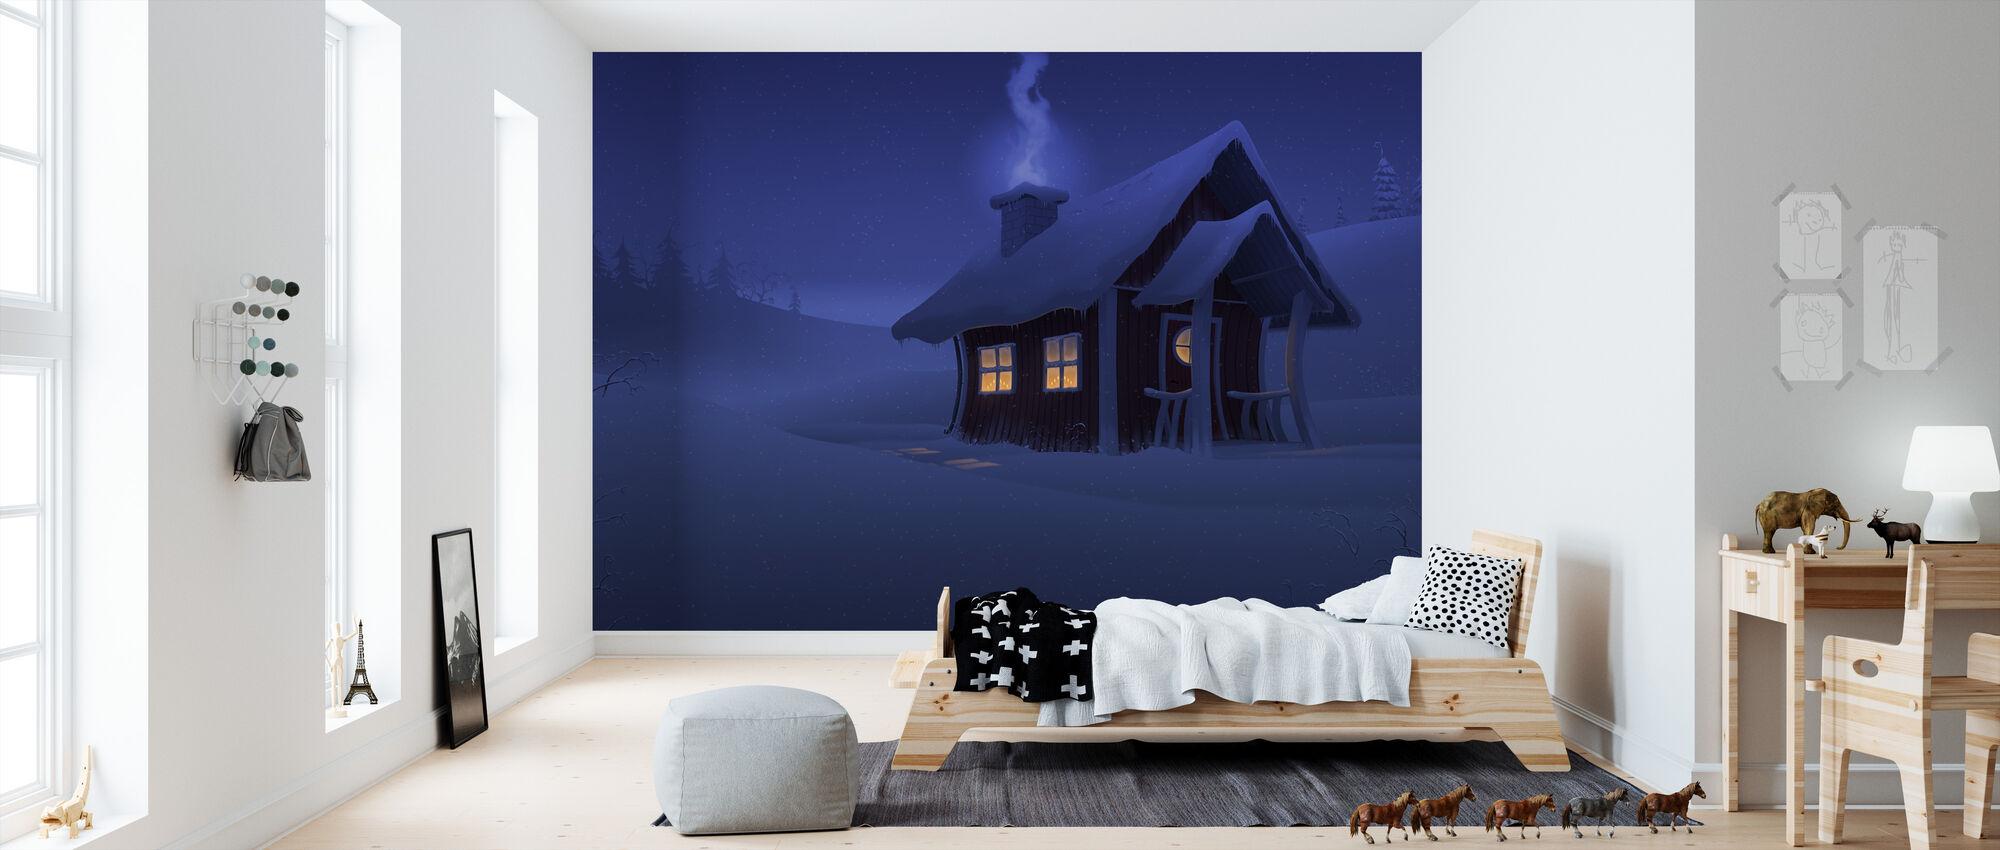 Xmas House - Wallpaper - Kids Room